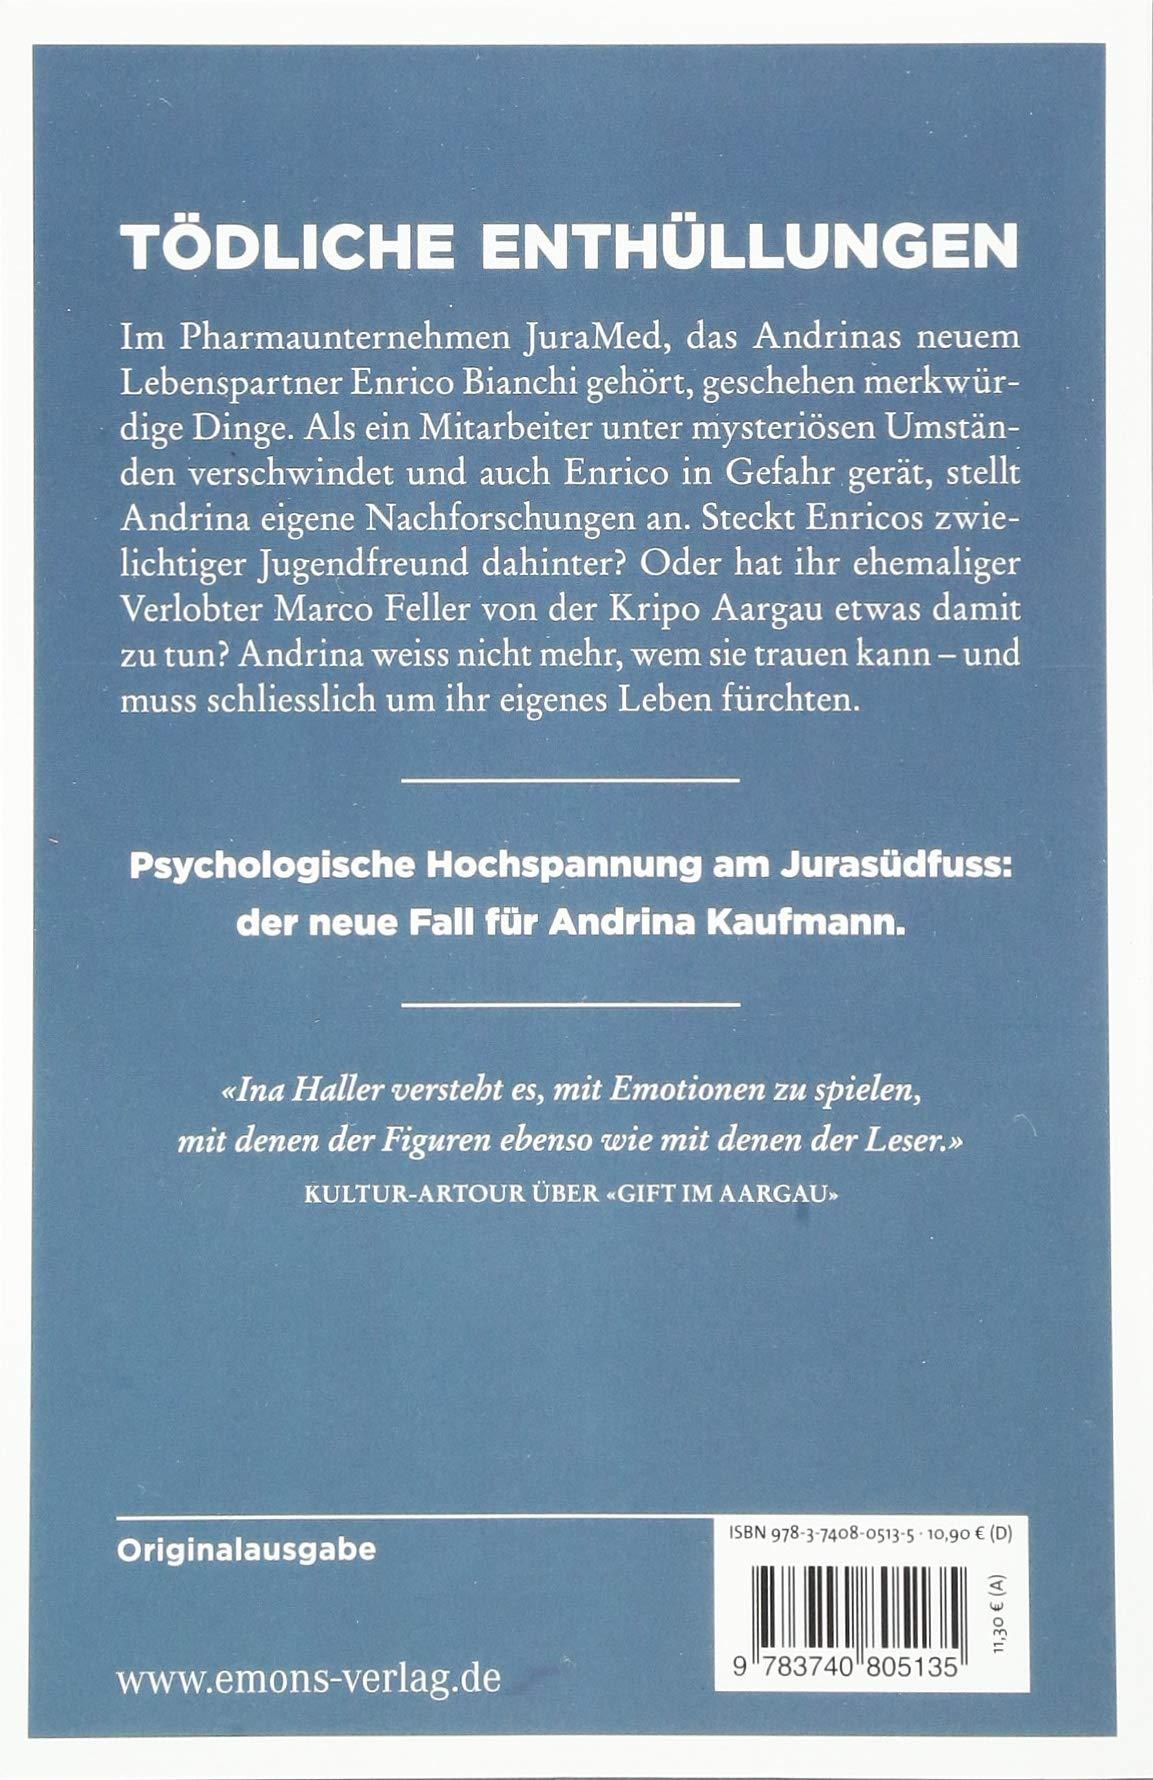 a29e1d045a342 Aarauer Finsternis  Kriminalroman  Amazon.de  Ina Haller  Bücher